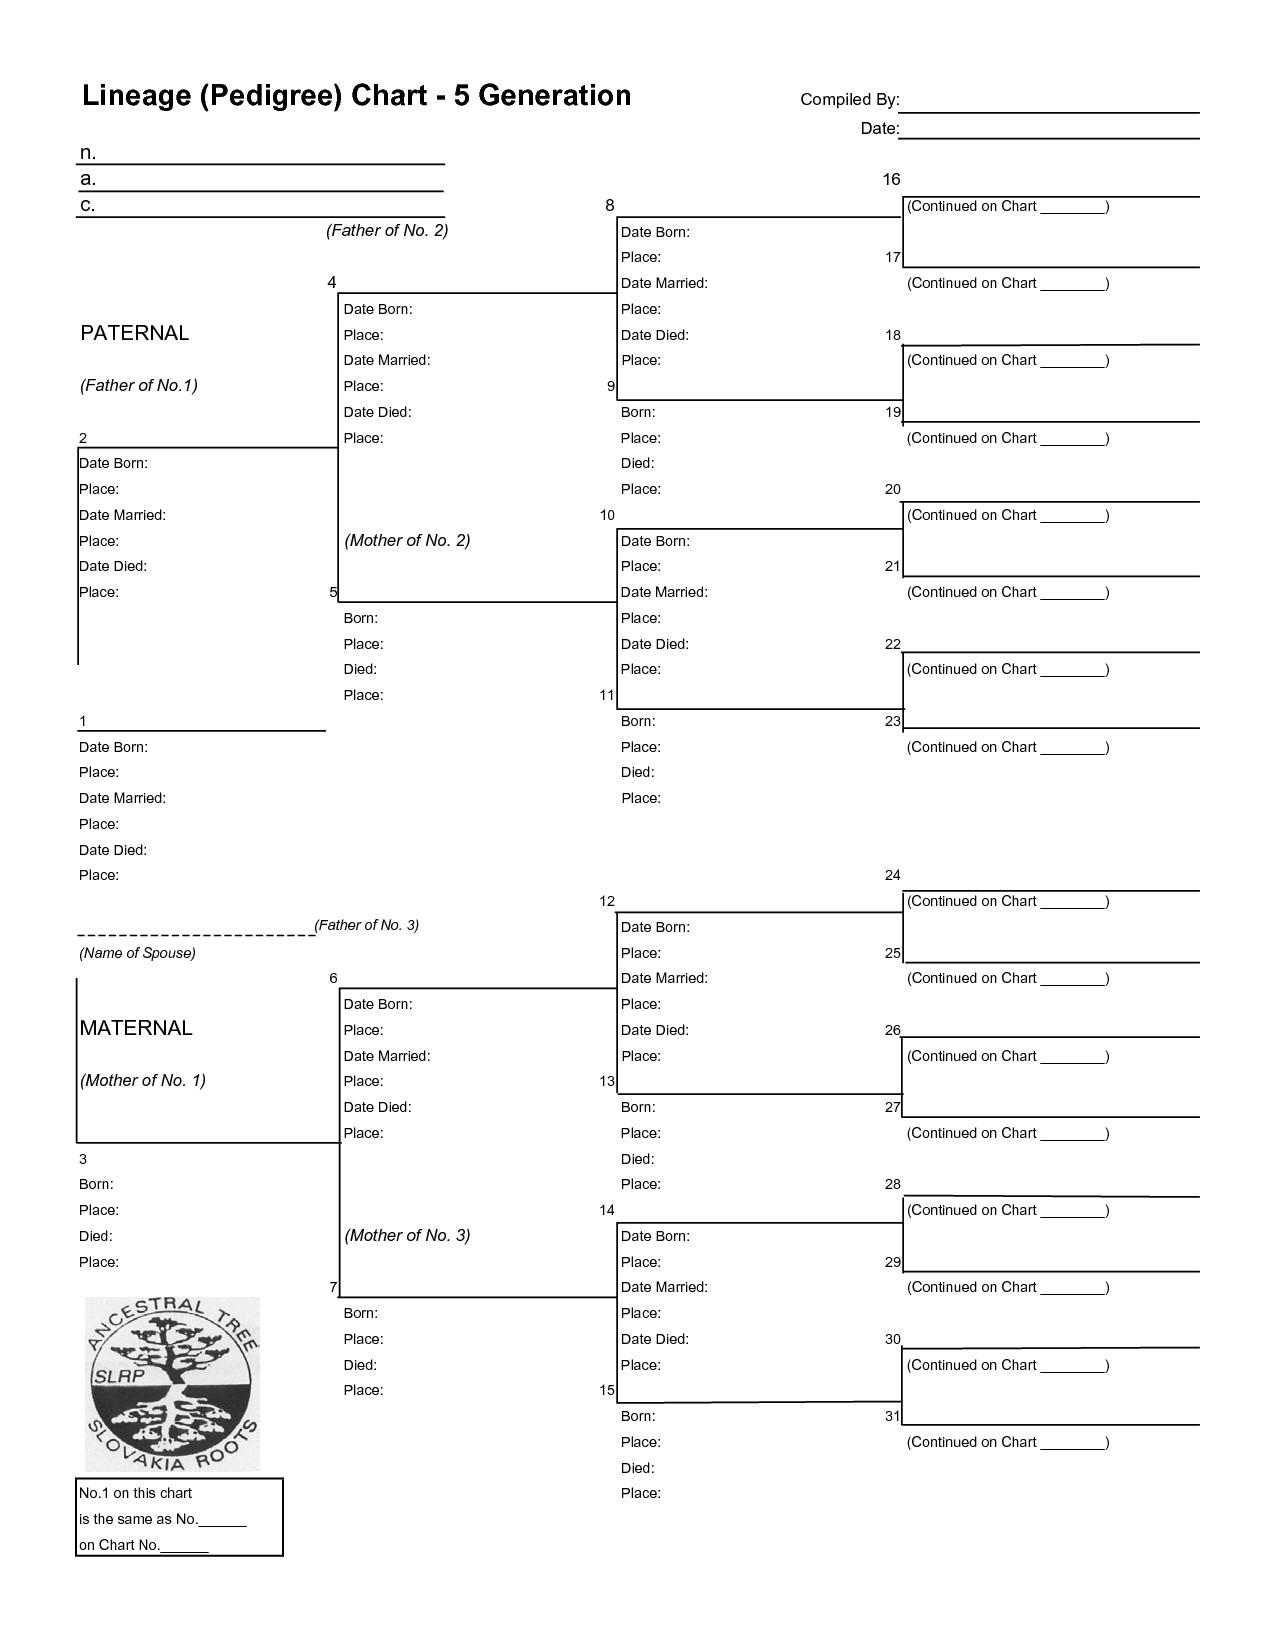 6 Generation Pedigree Chart 12 Best Of Family Tree Pedigree Chart Worksheet 6